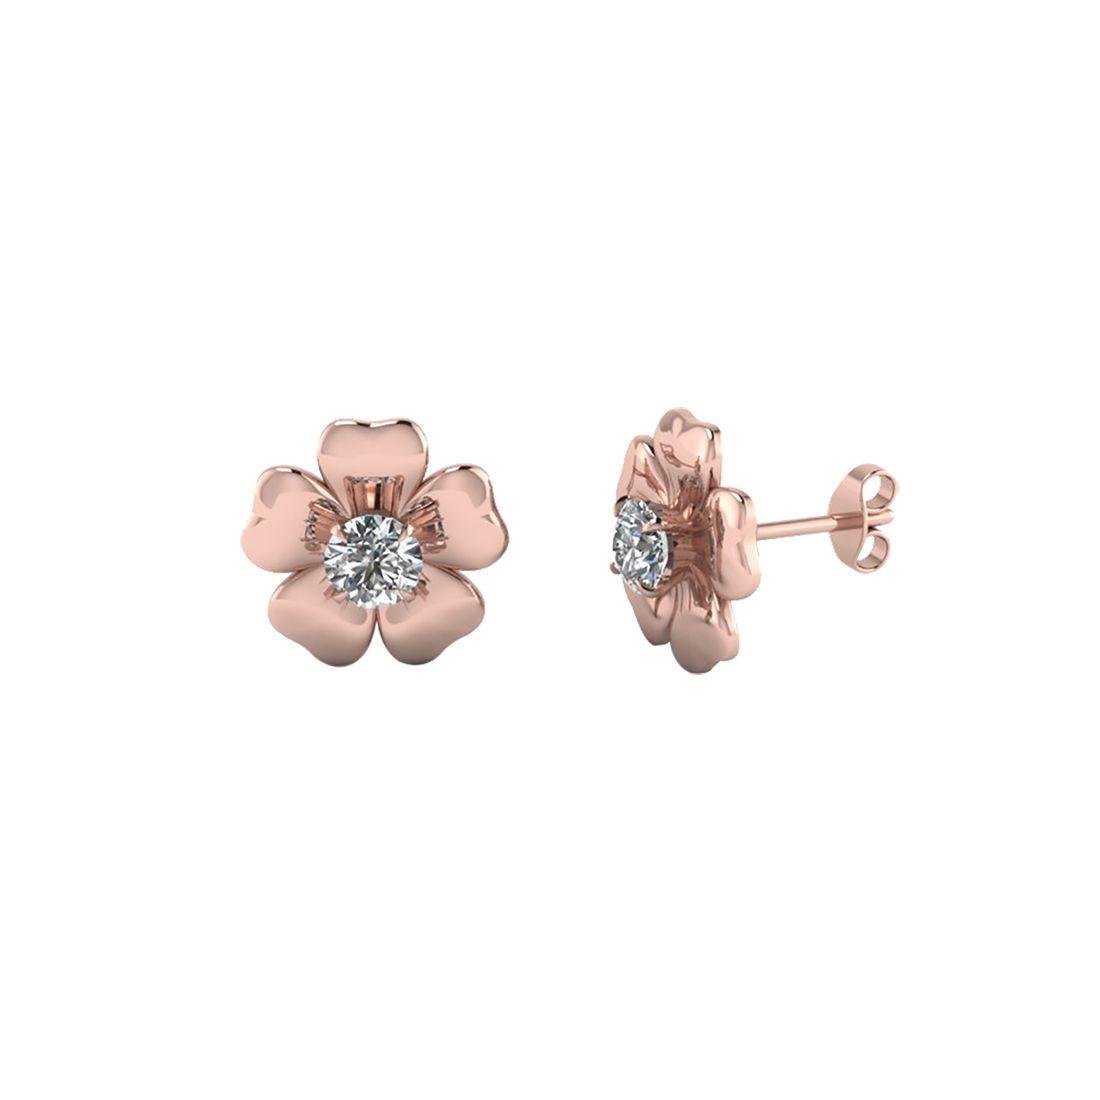 Amantran Gems And Jewels 14k Gold Diamond Studs